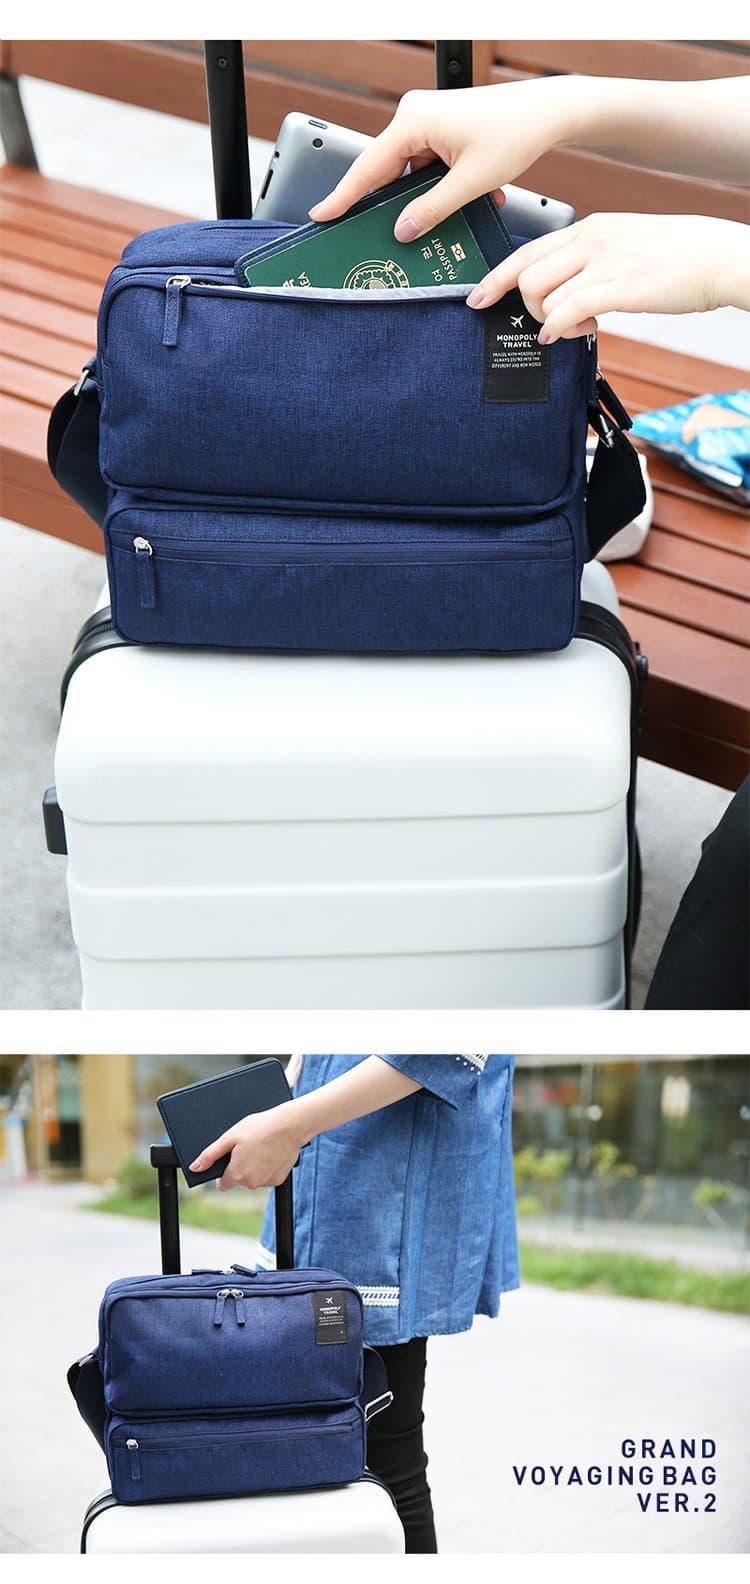 TP Tas Selempang IPAD Ver 2 Travel Organizer import - Tas kerja Pria G3 -  Abu -abu Tua GSR 9fe6256816